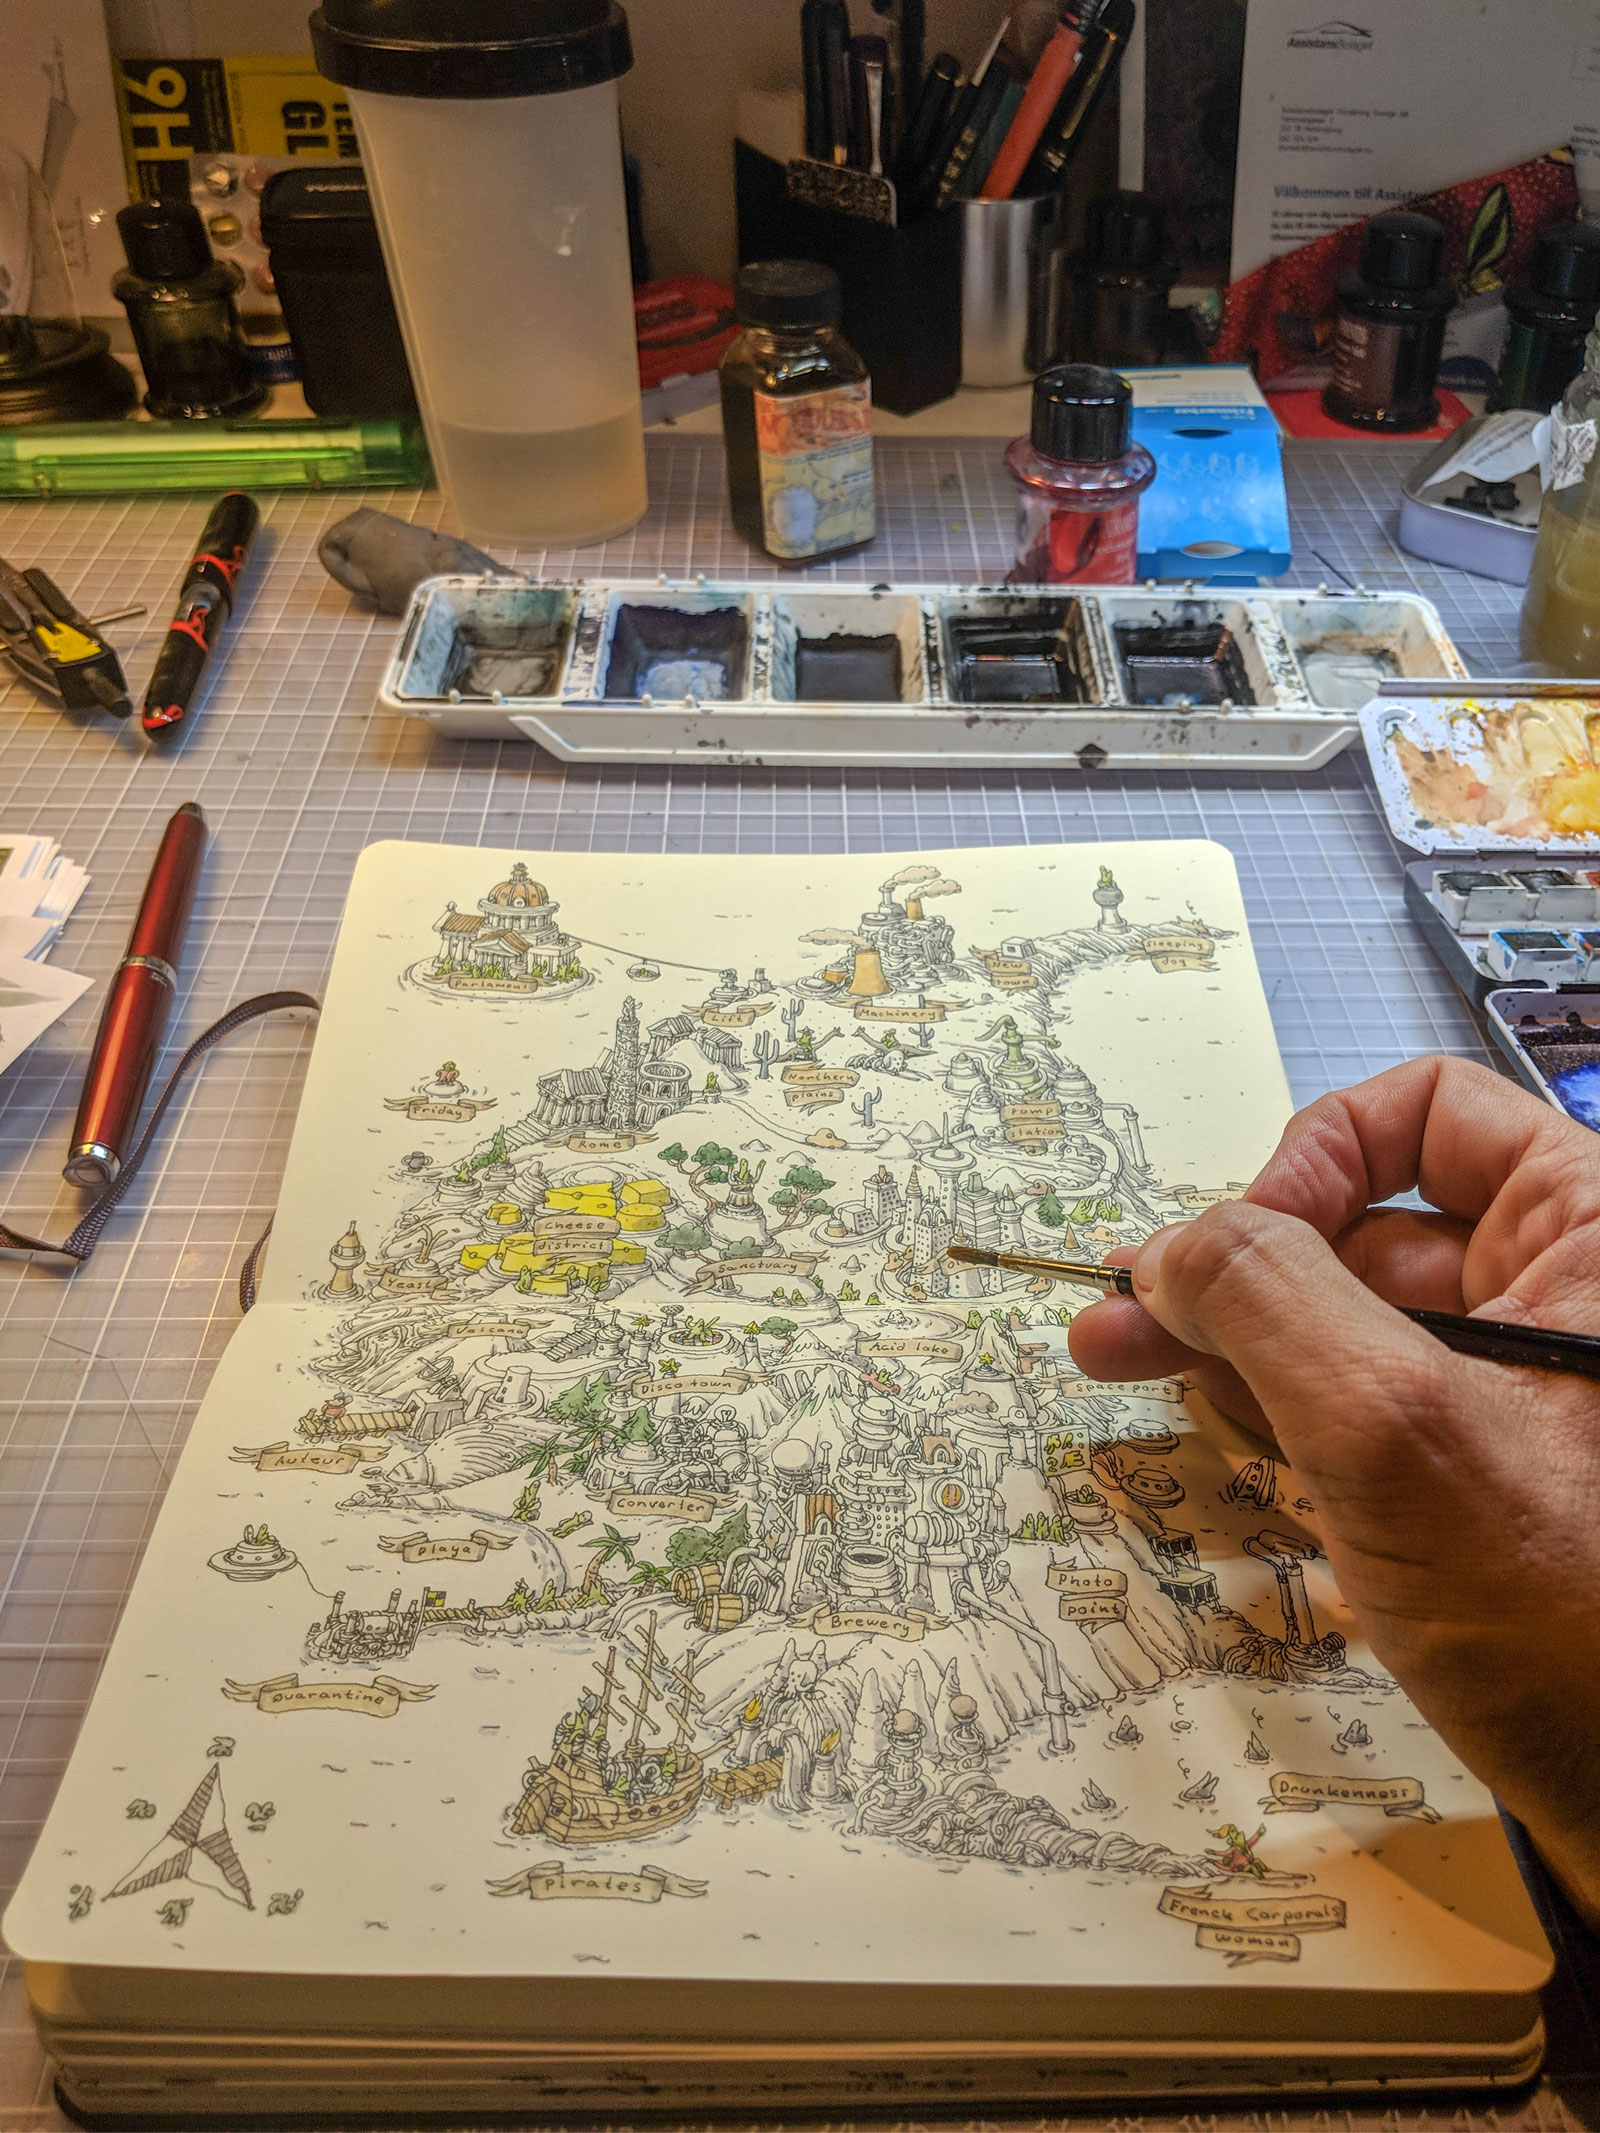 Map by MattiasA